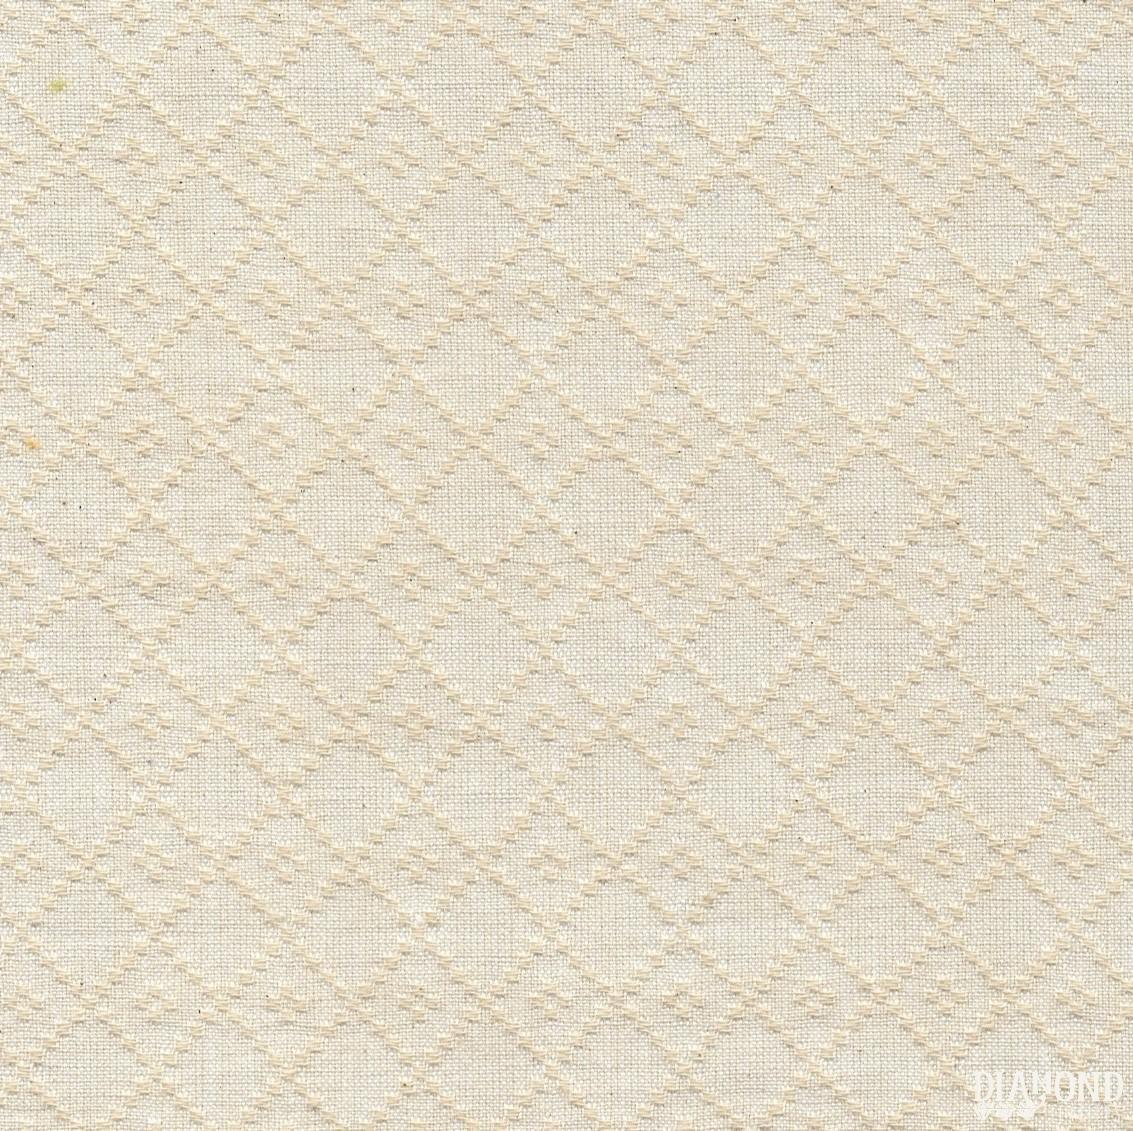 24 Piece Only Nikko III Cream Woven 4621